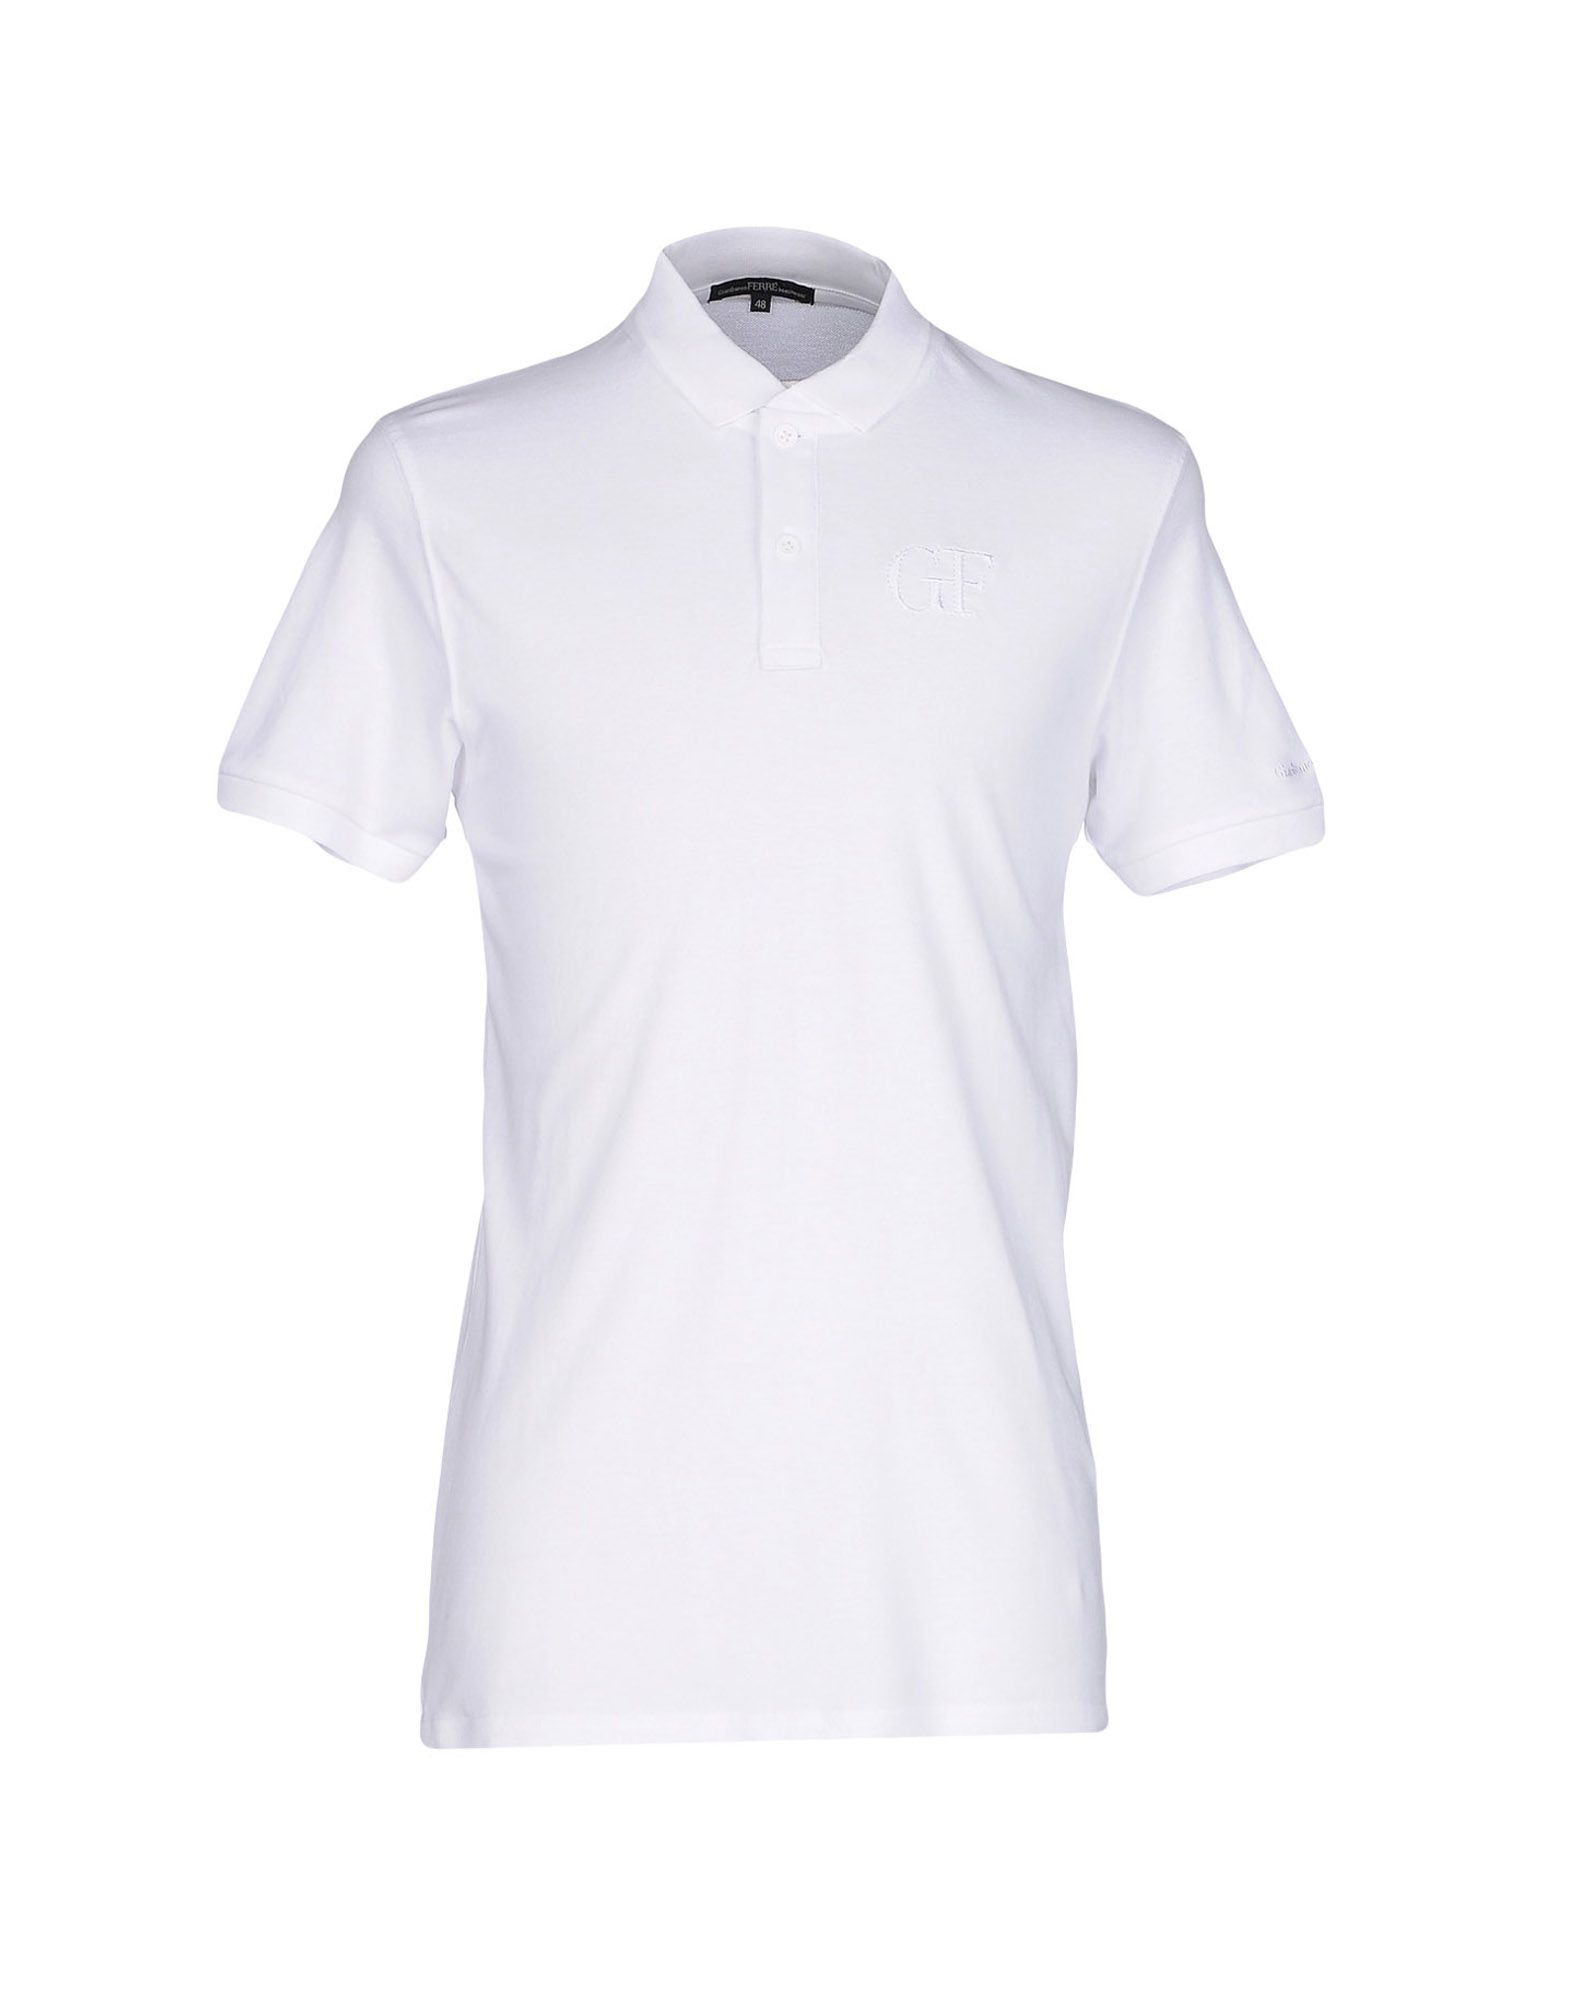 62686e5f2 Gianfranco Ferre' Beachwear Polo Shirt - Men Gianfranco Ferre' Beachwear Polo  Shirts online on YOOX Finland - 37915449